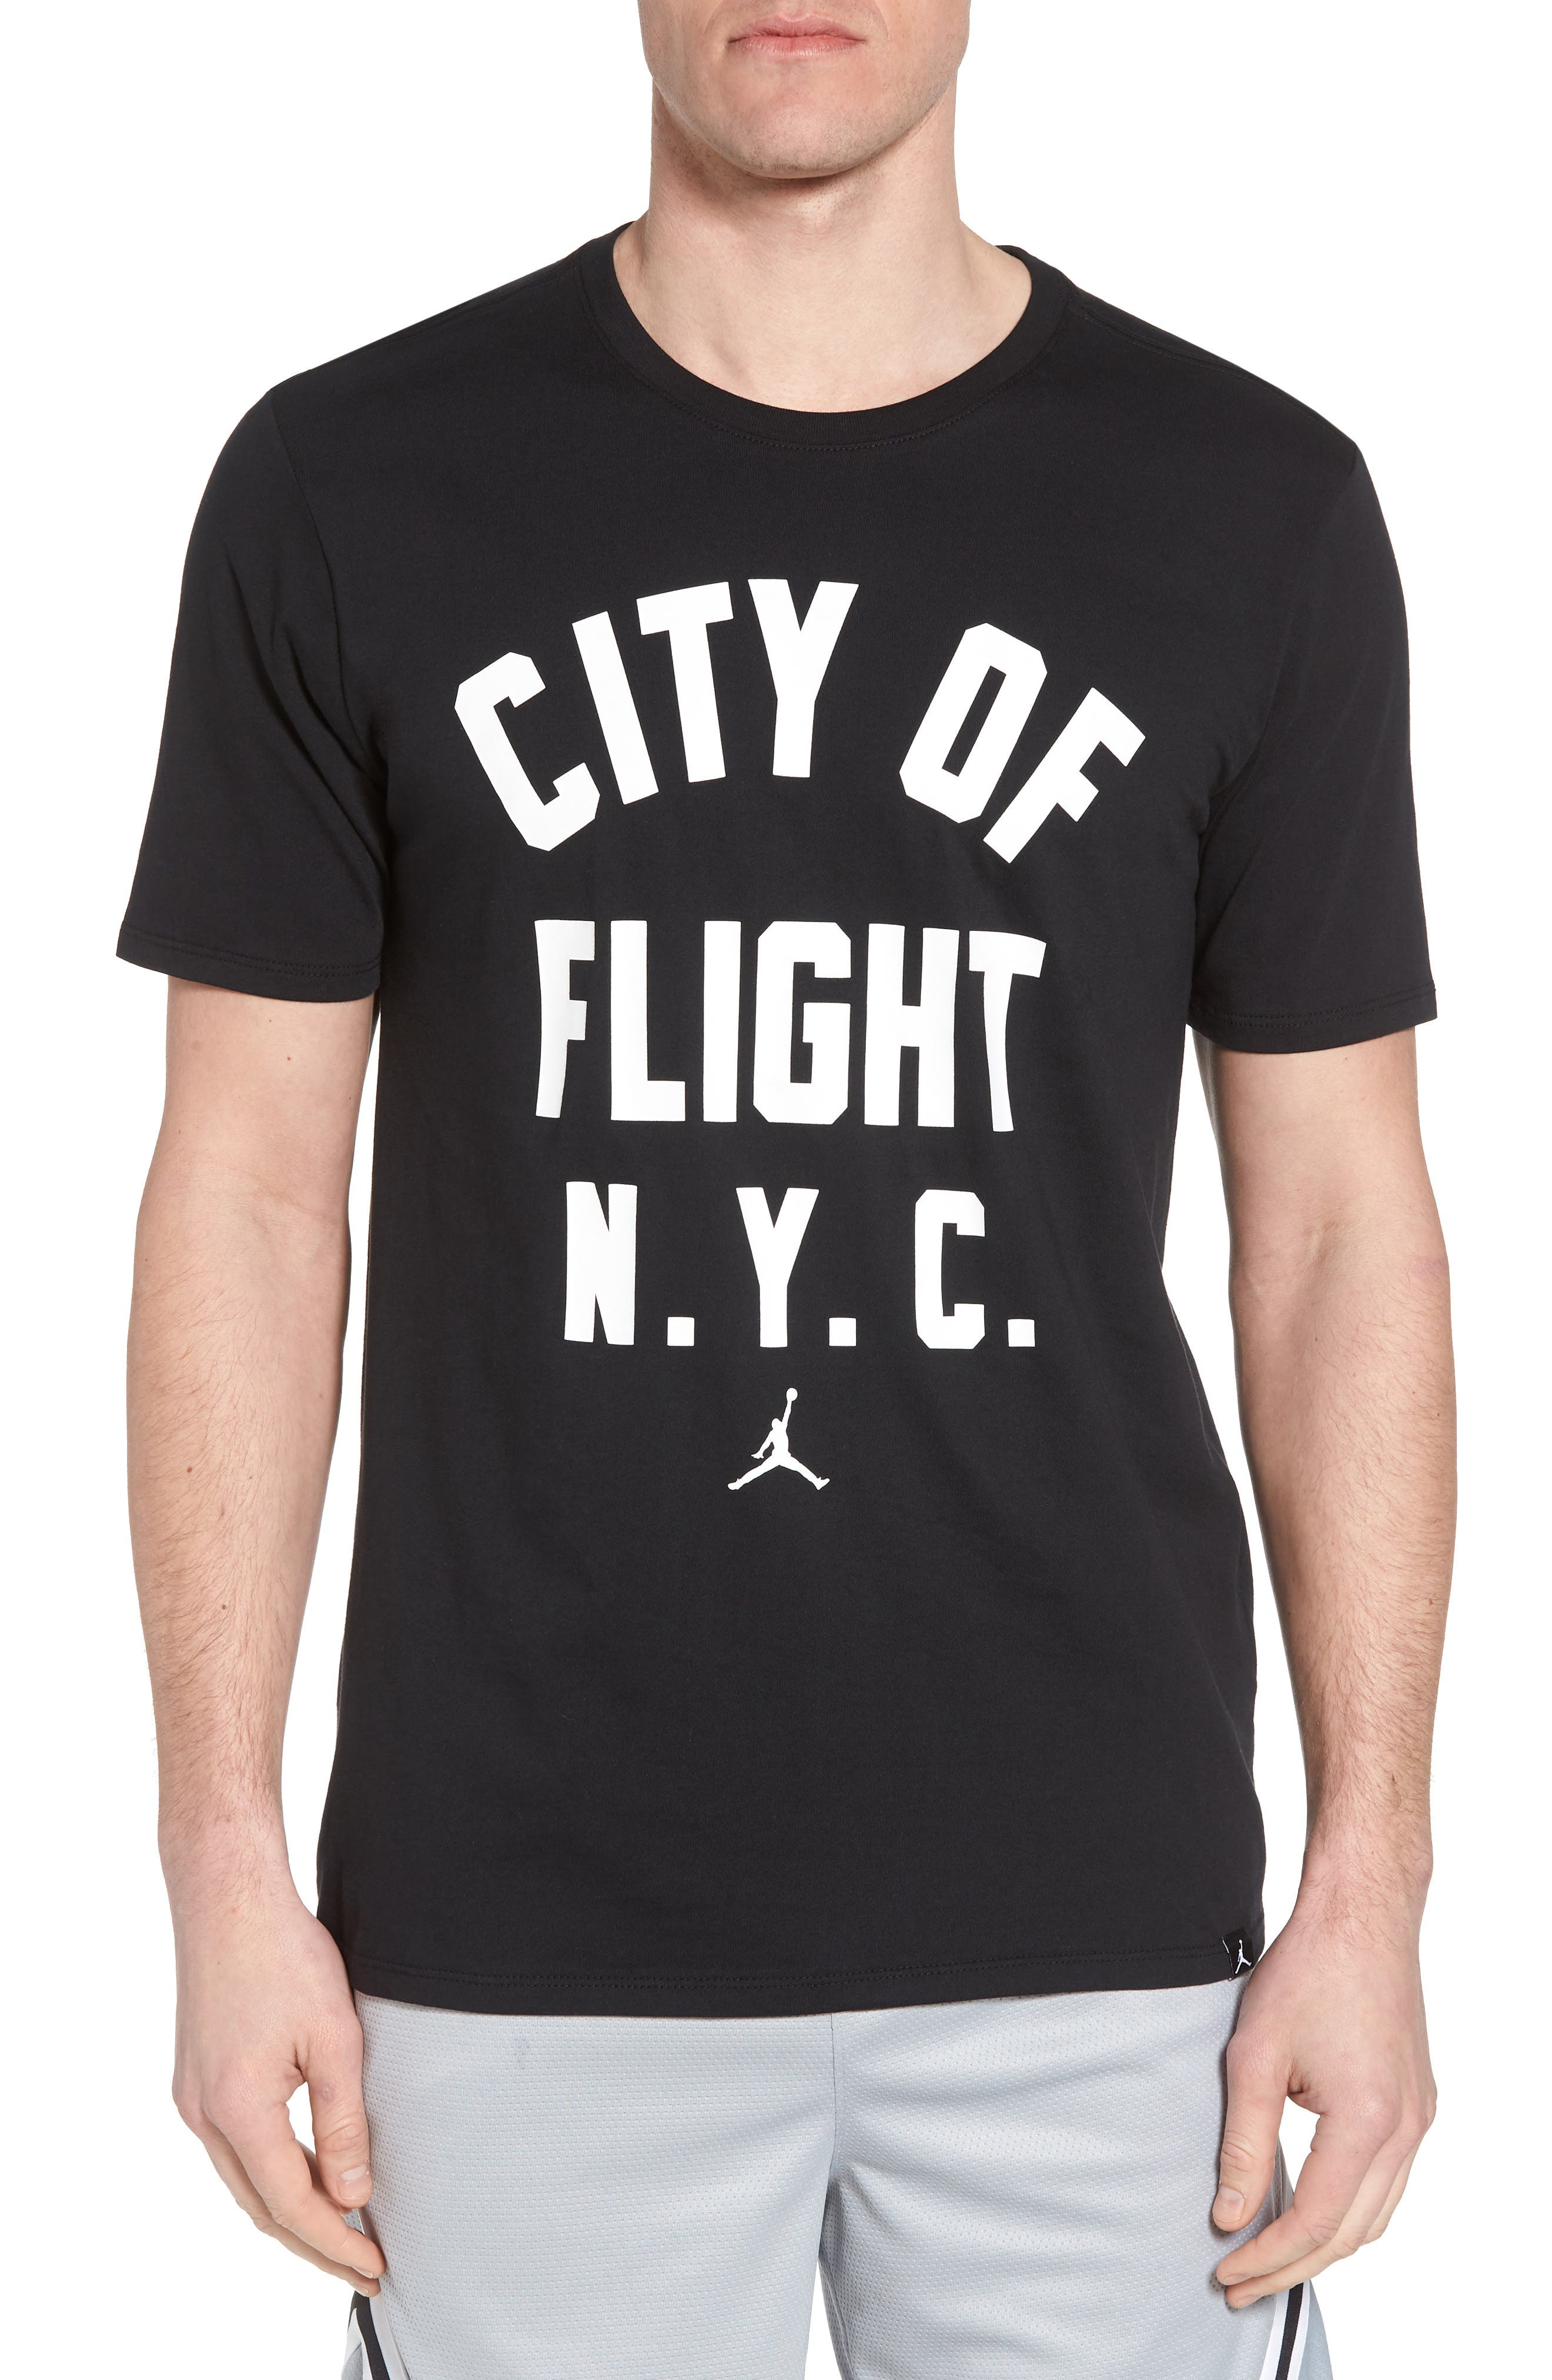 Sportswear City of Flight T-Shirt,                         Main,                         color, Black/ White